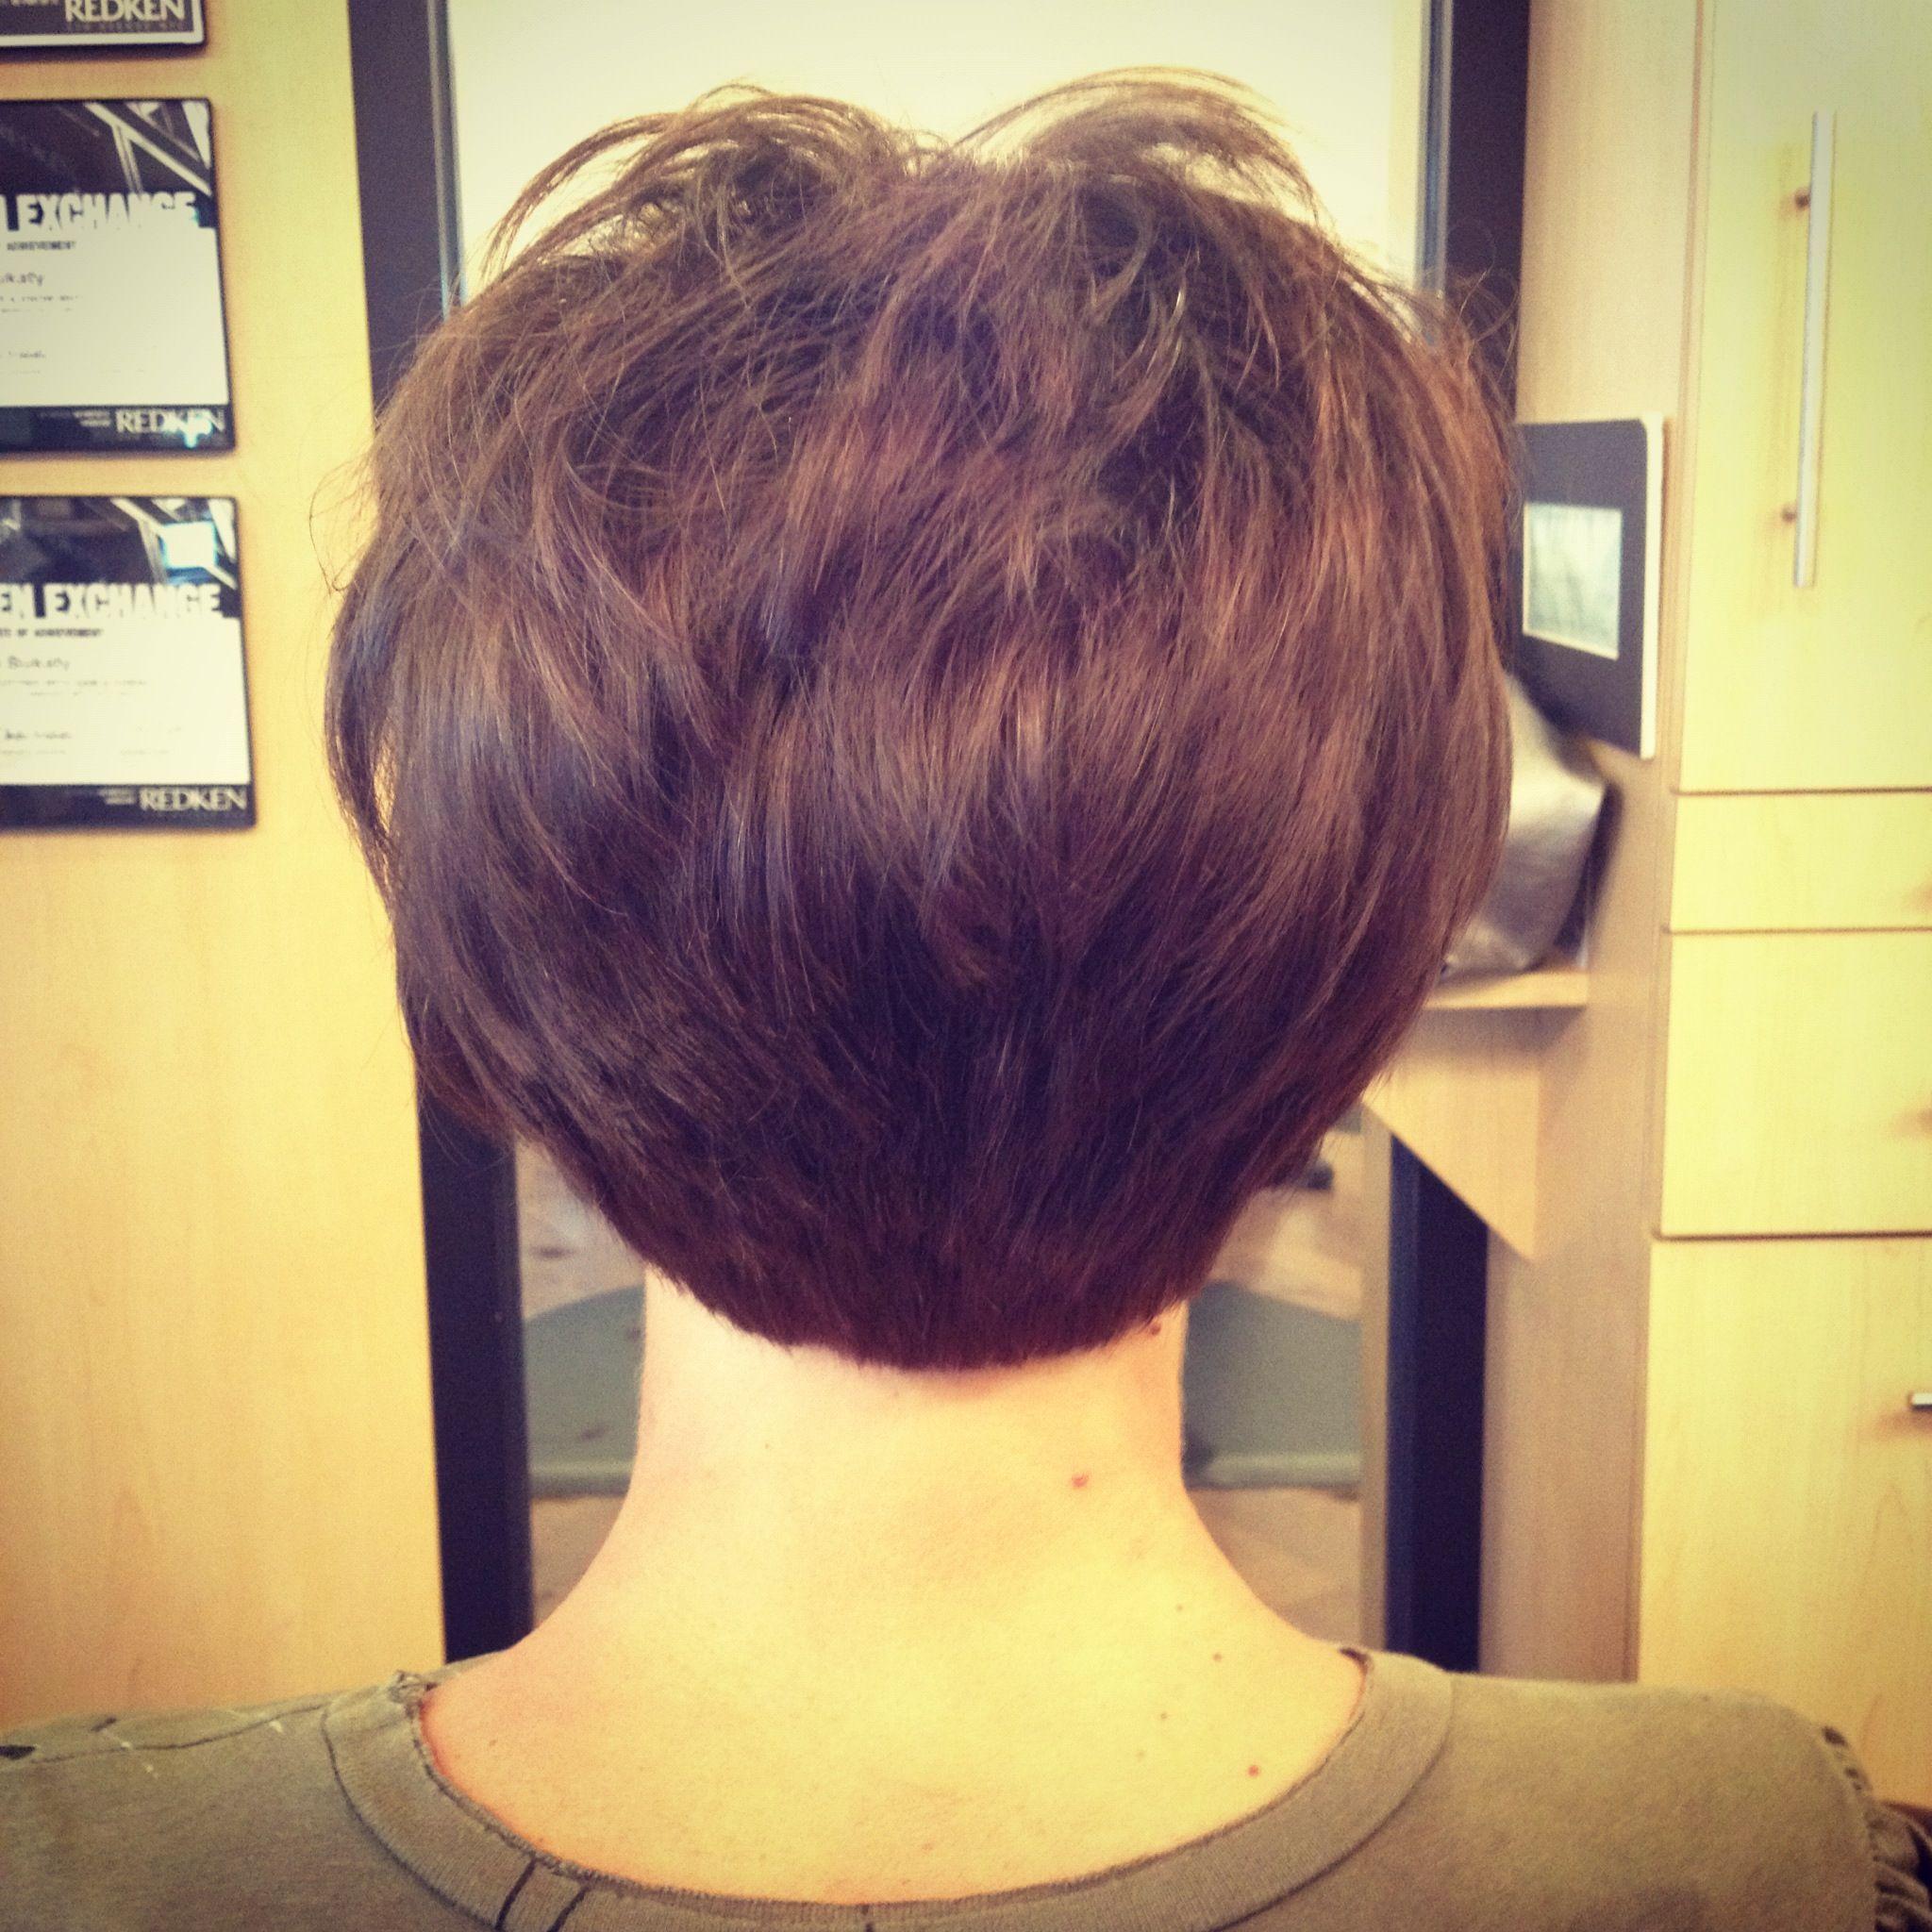 Salon Style Hair: Short Stacked Bob Haircut By Debbie At Encounters Salon